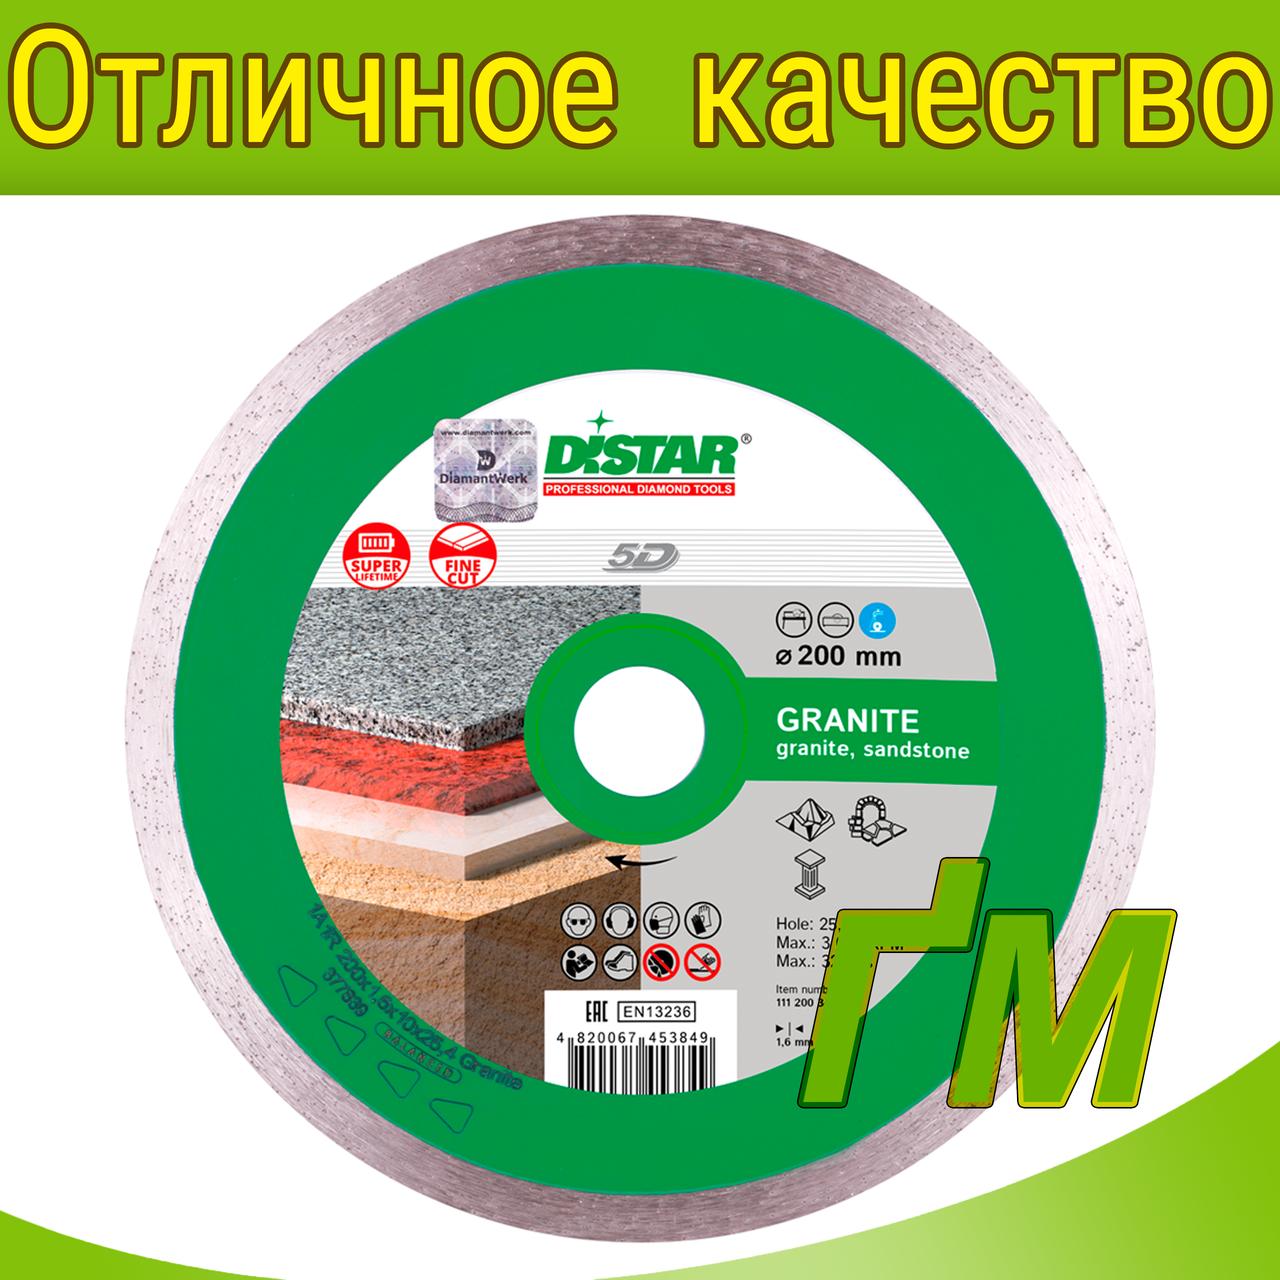 Алмазные диски для станков Distar Granite 1A1R 150x1,4x8x25,4